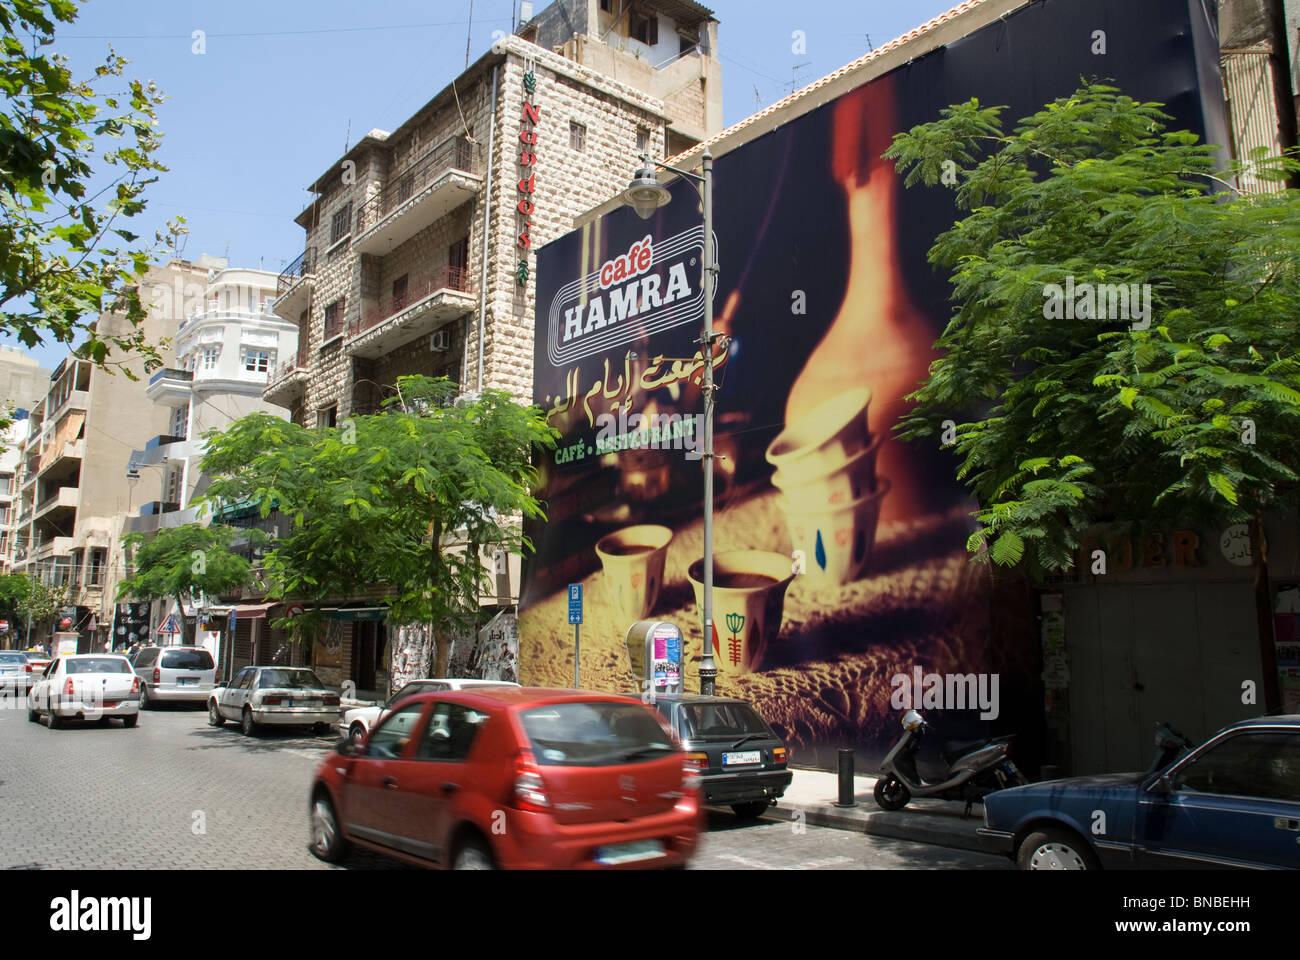 Hamra street Beirut Lebanon - Stock Image